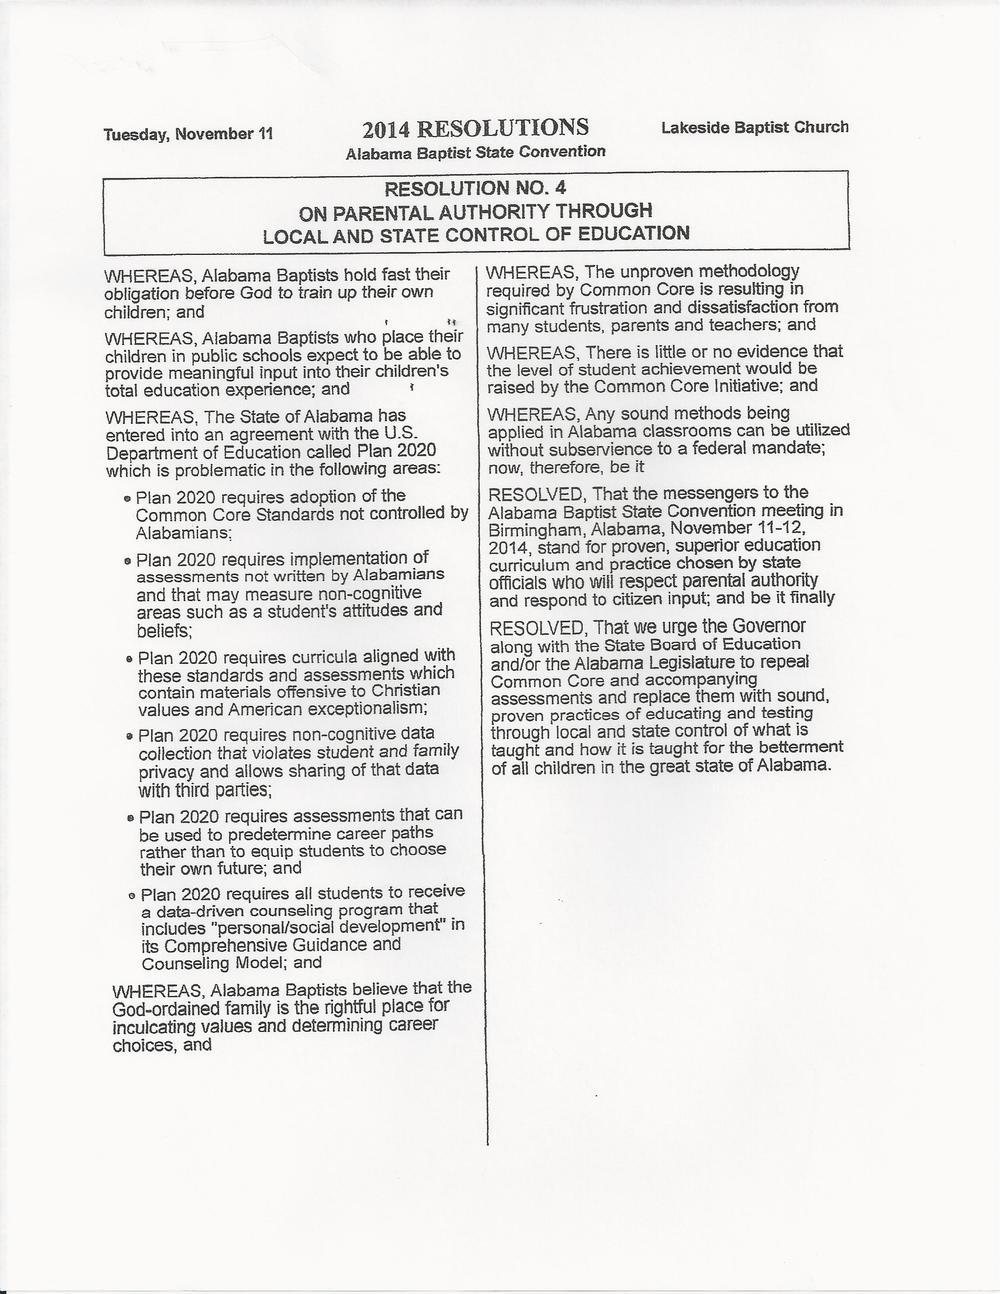 AL Baptist Resolution attach w? Dr. Killian's Letter